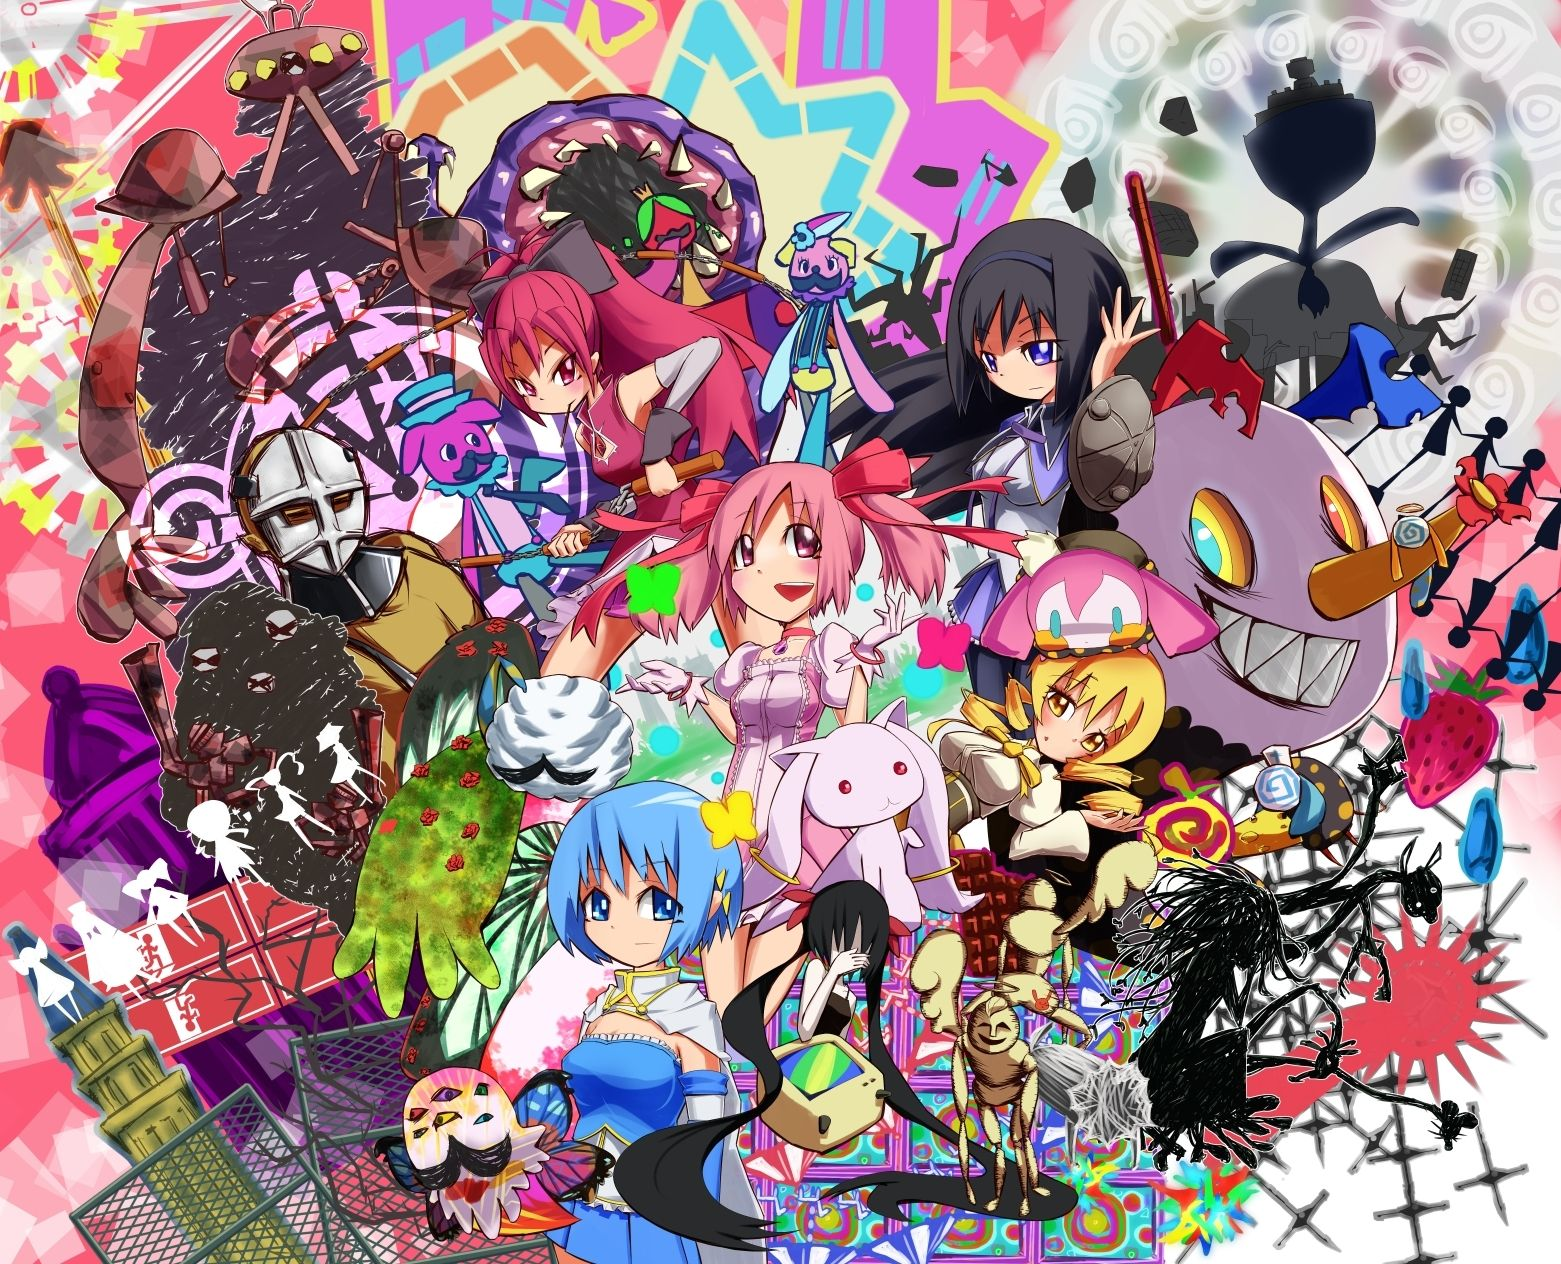 Mahou Shoujo Madoka Magica Wallpaper Madoka Magica Anime